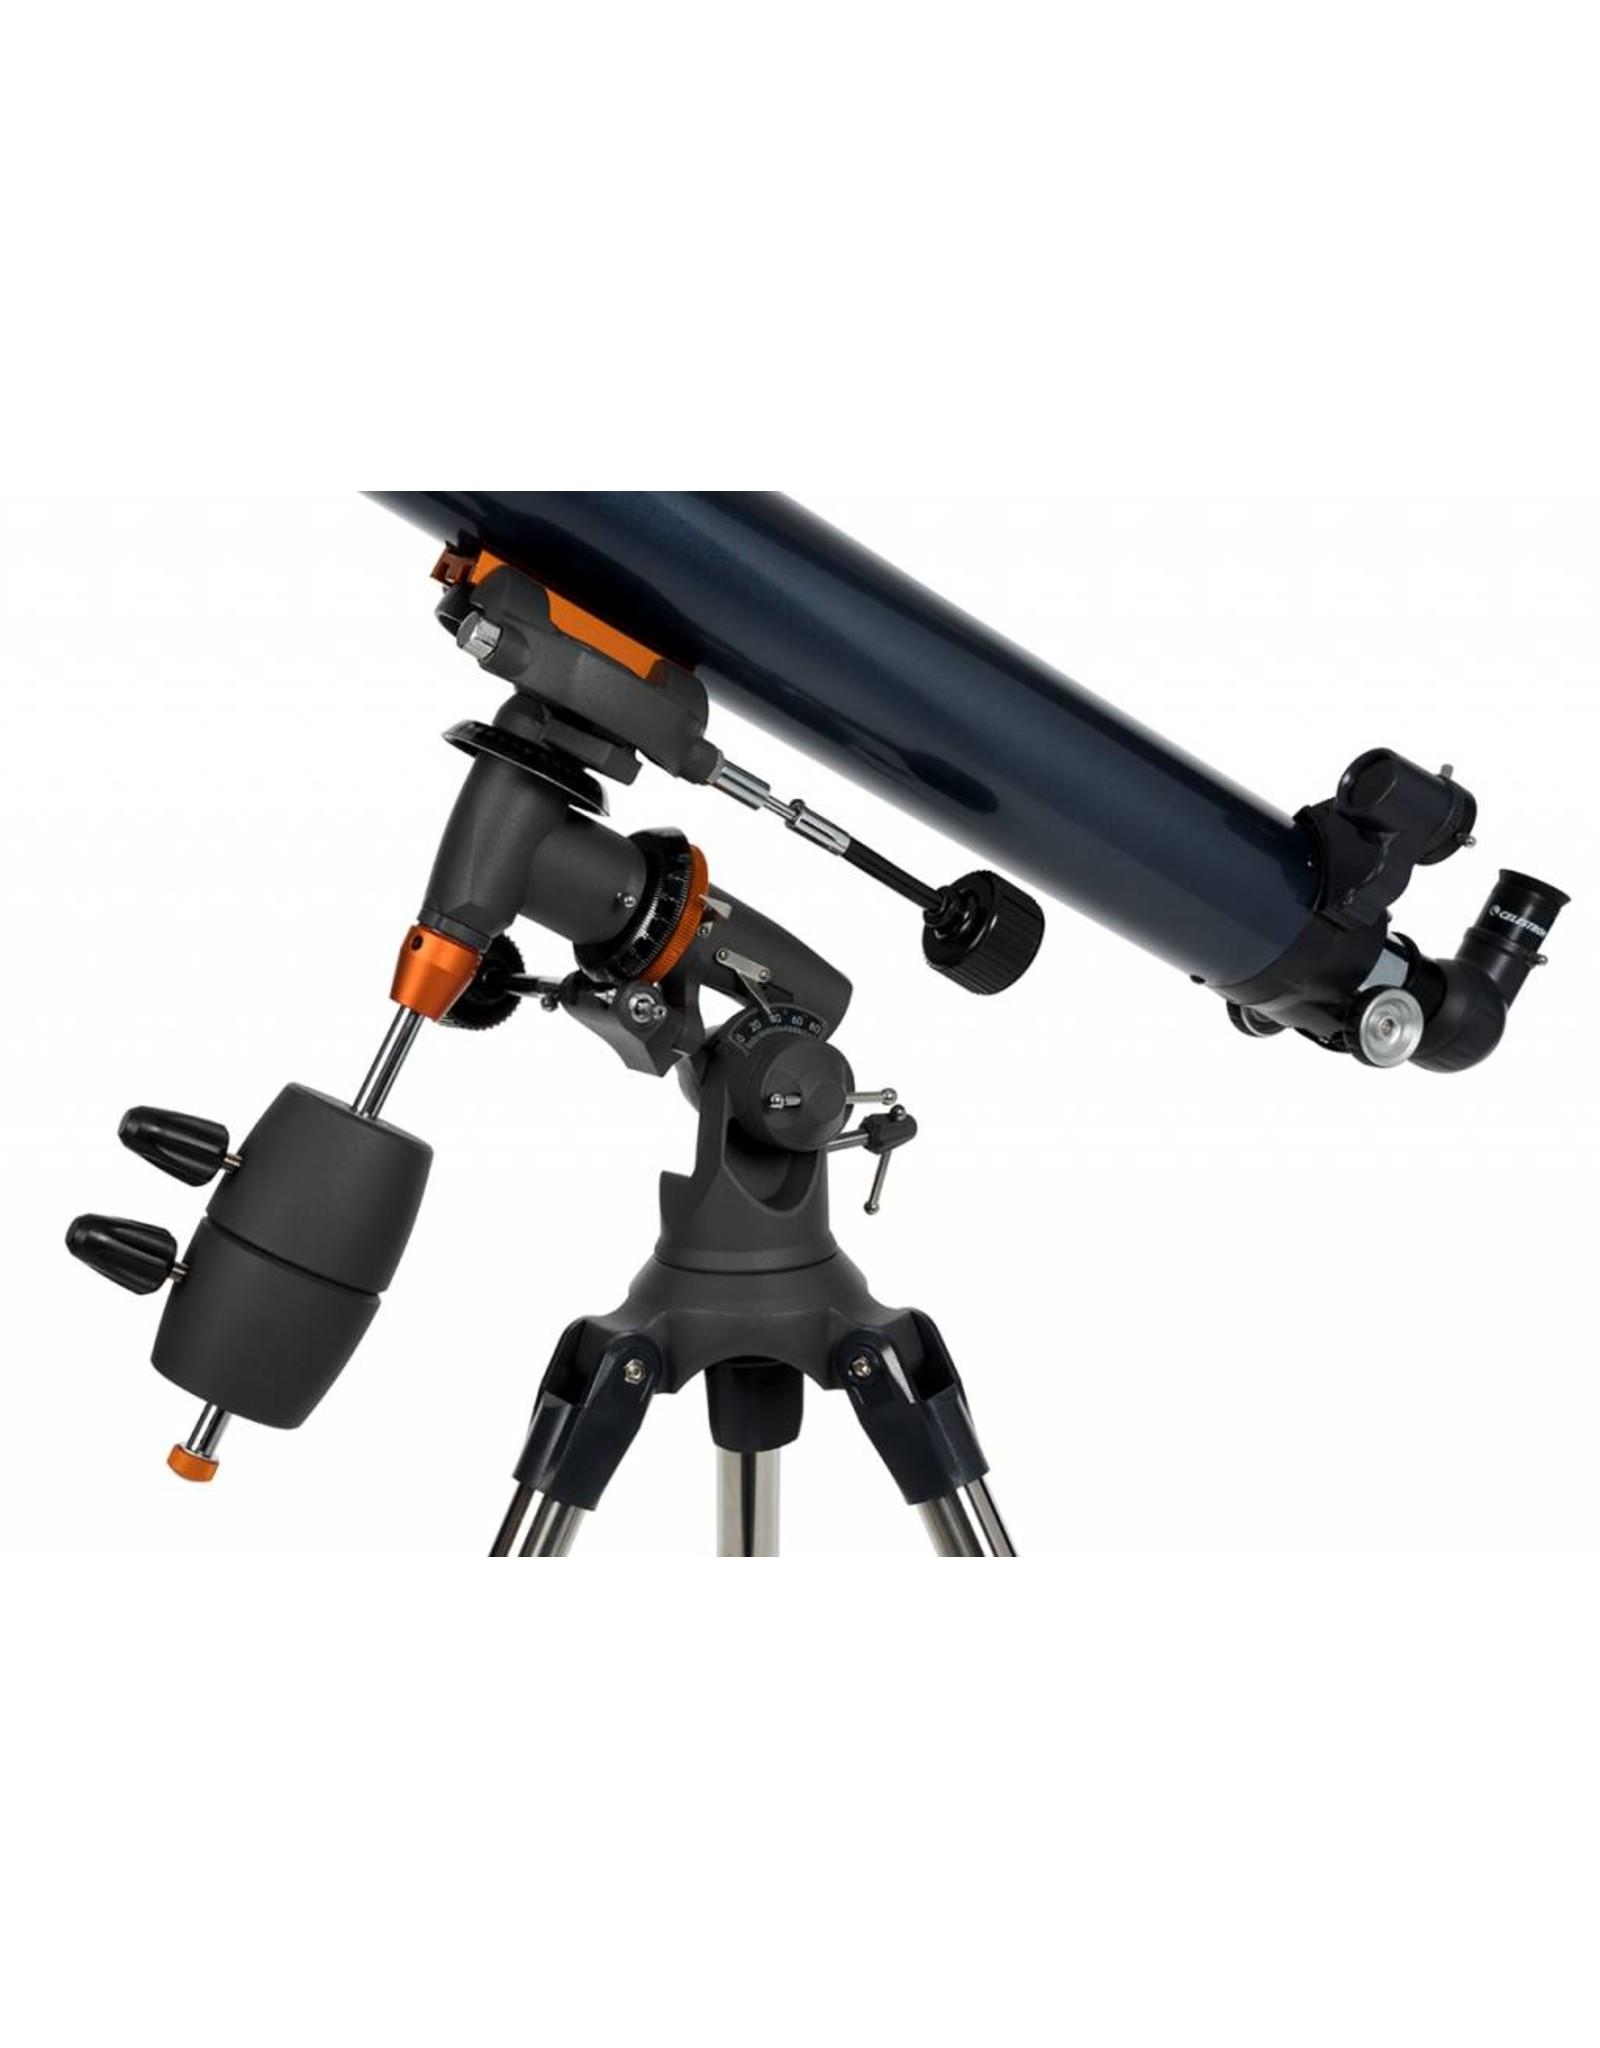 Celestron Celestron AstroMaster 90EQ Refractor